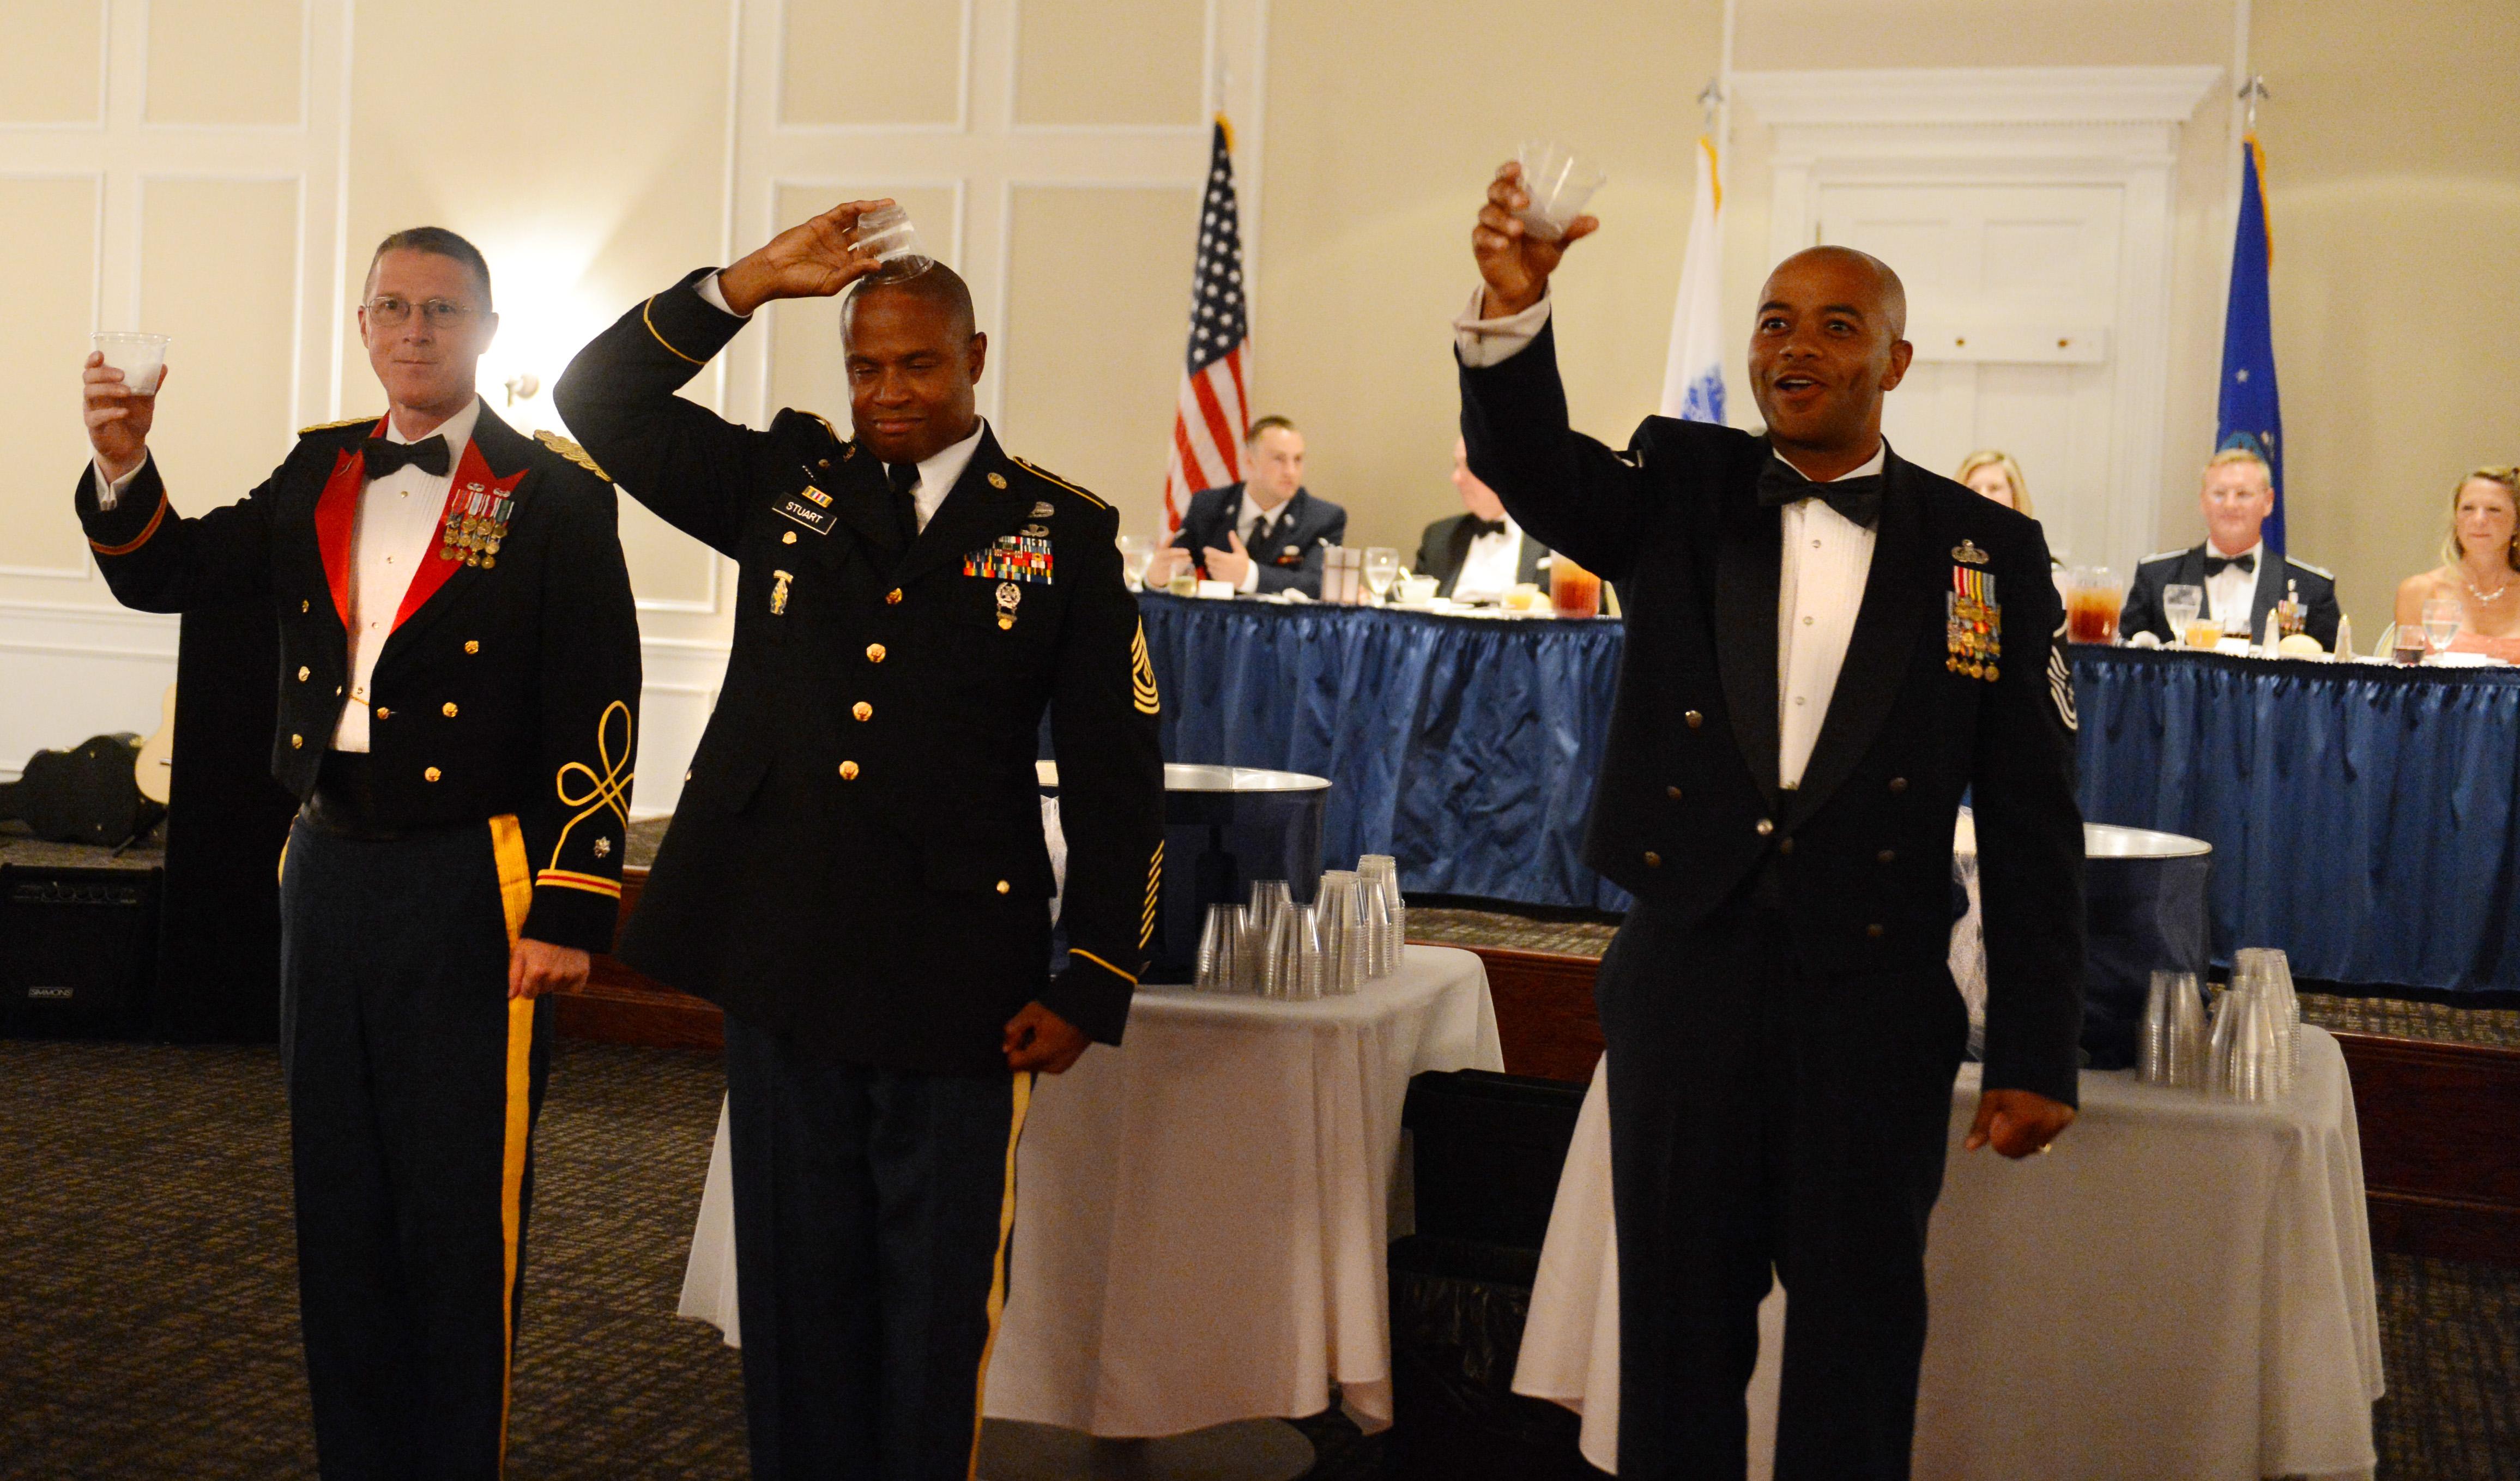 Army mess dress uniform images